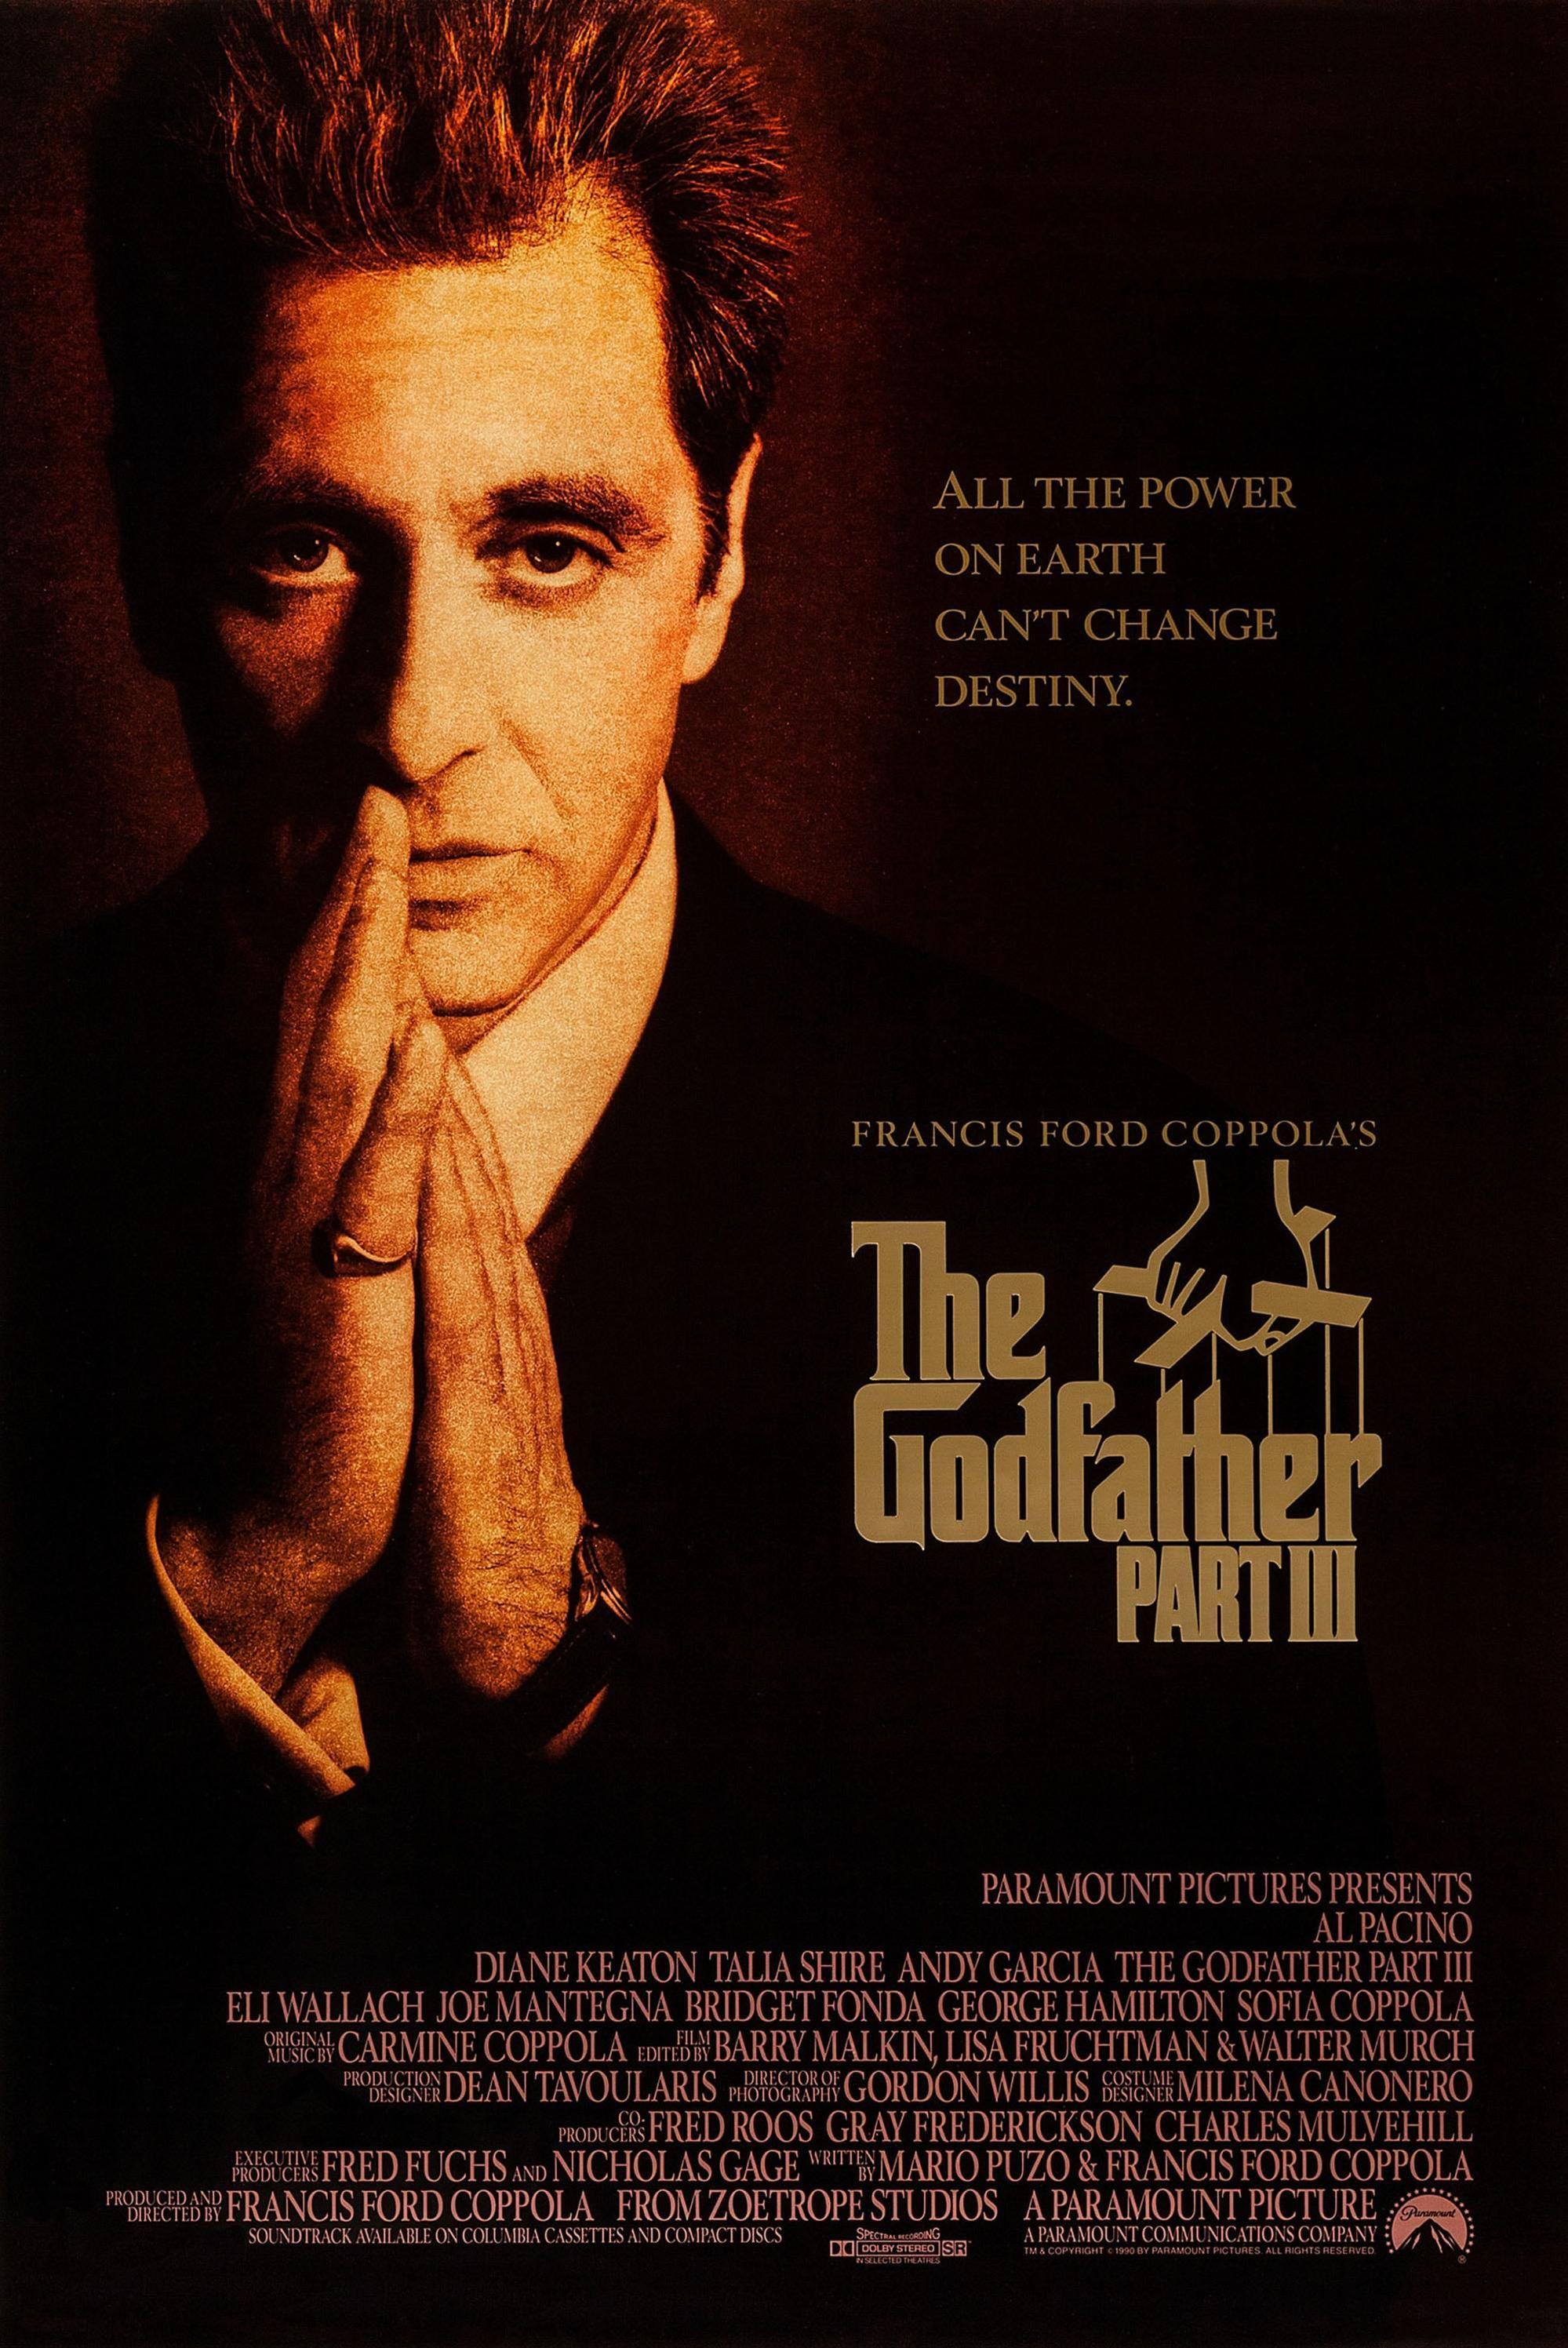 Baba 3 The Godfather 3 Filmini Izle Indirmeden Online Seyret